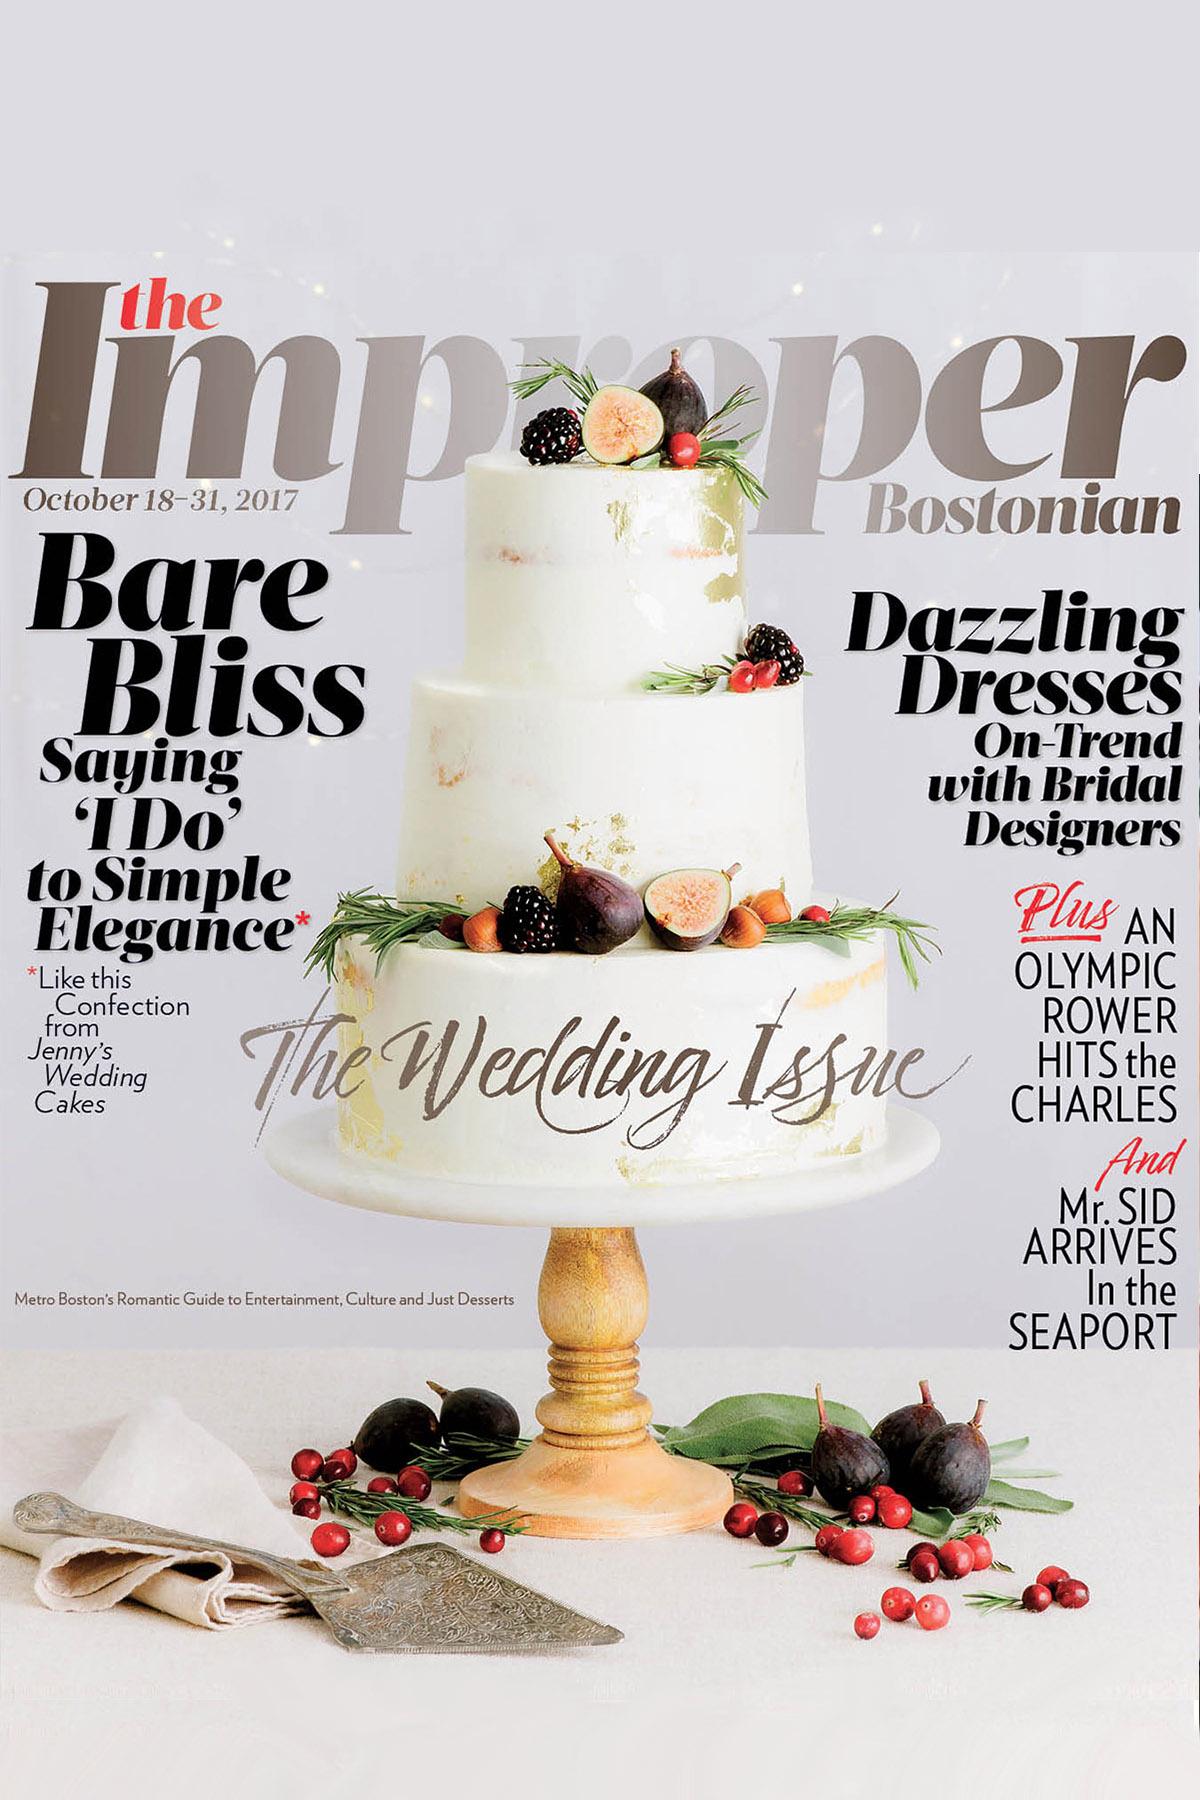 The Improper Bostonian: The Wedding Issue